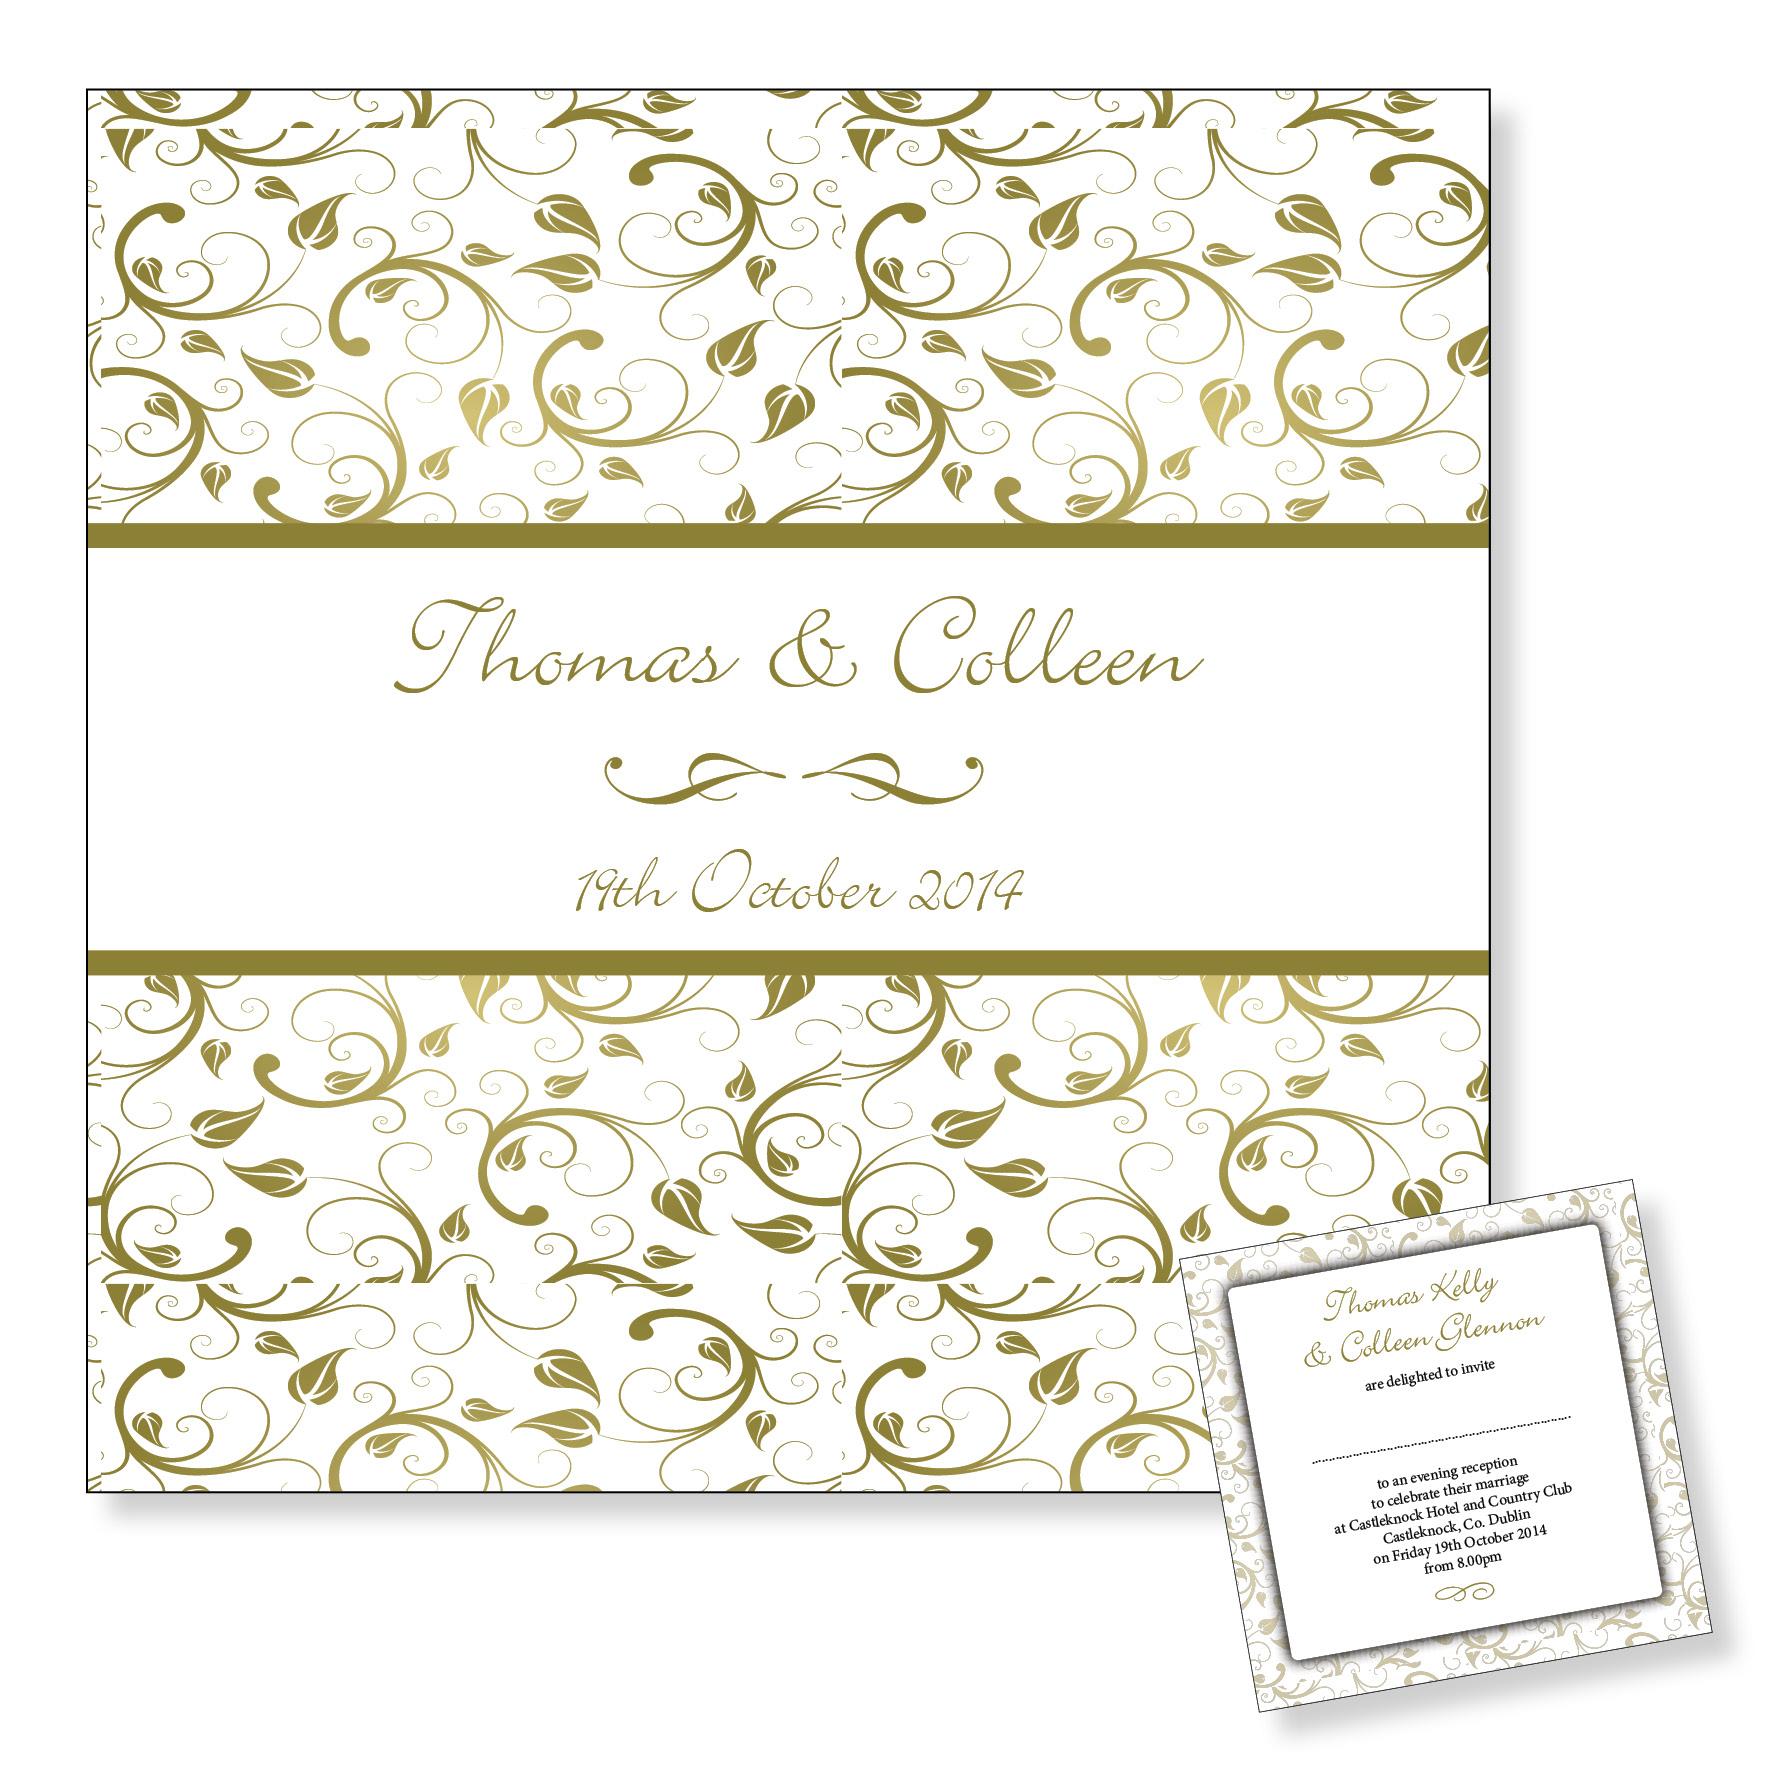 Evening wedding invitation - Gold floral